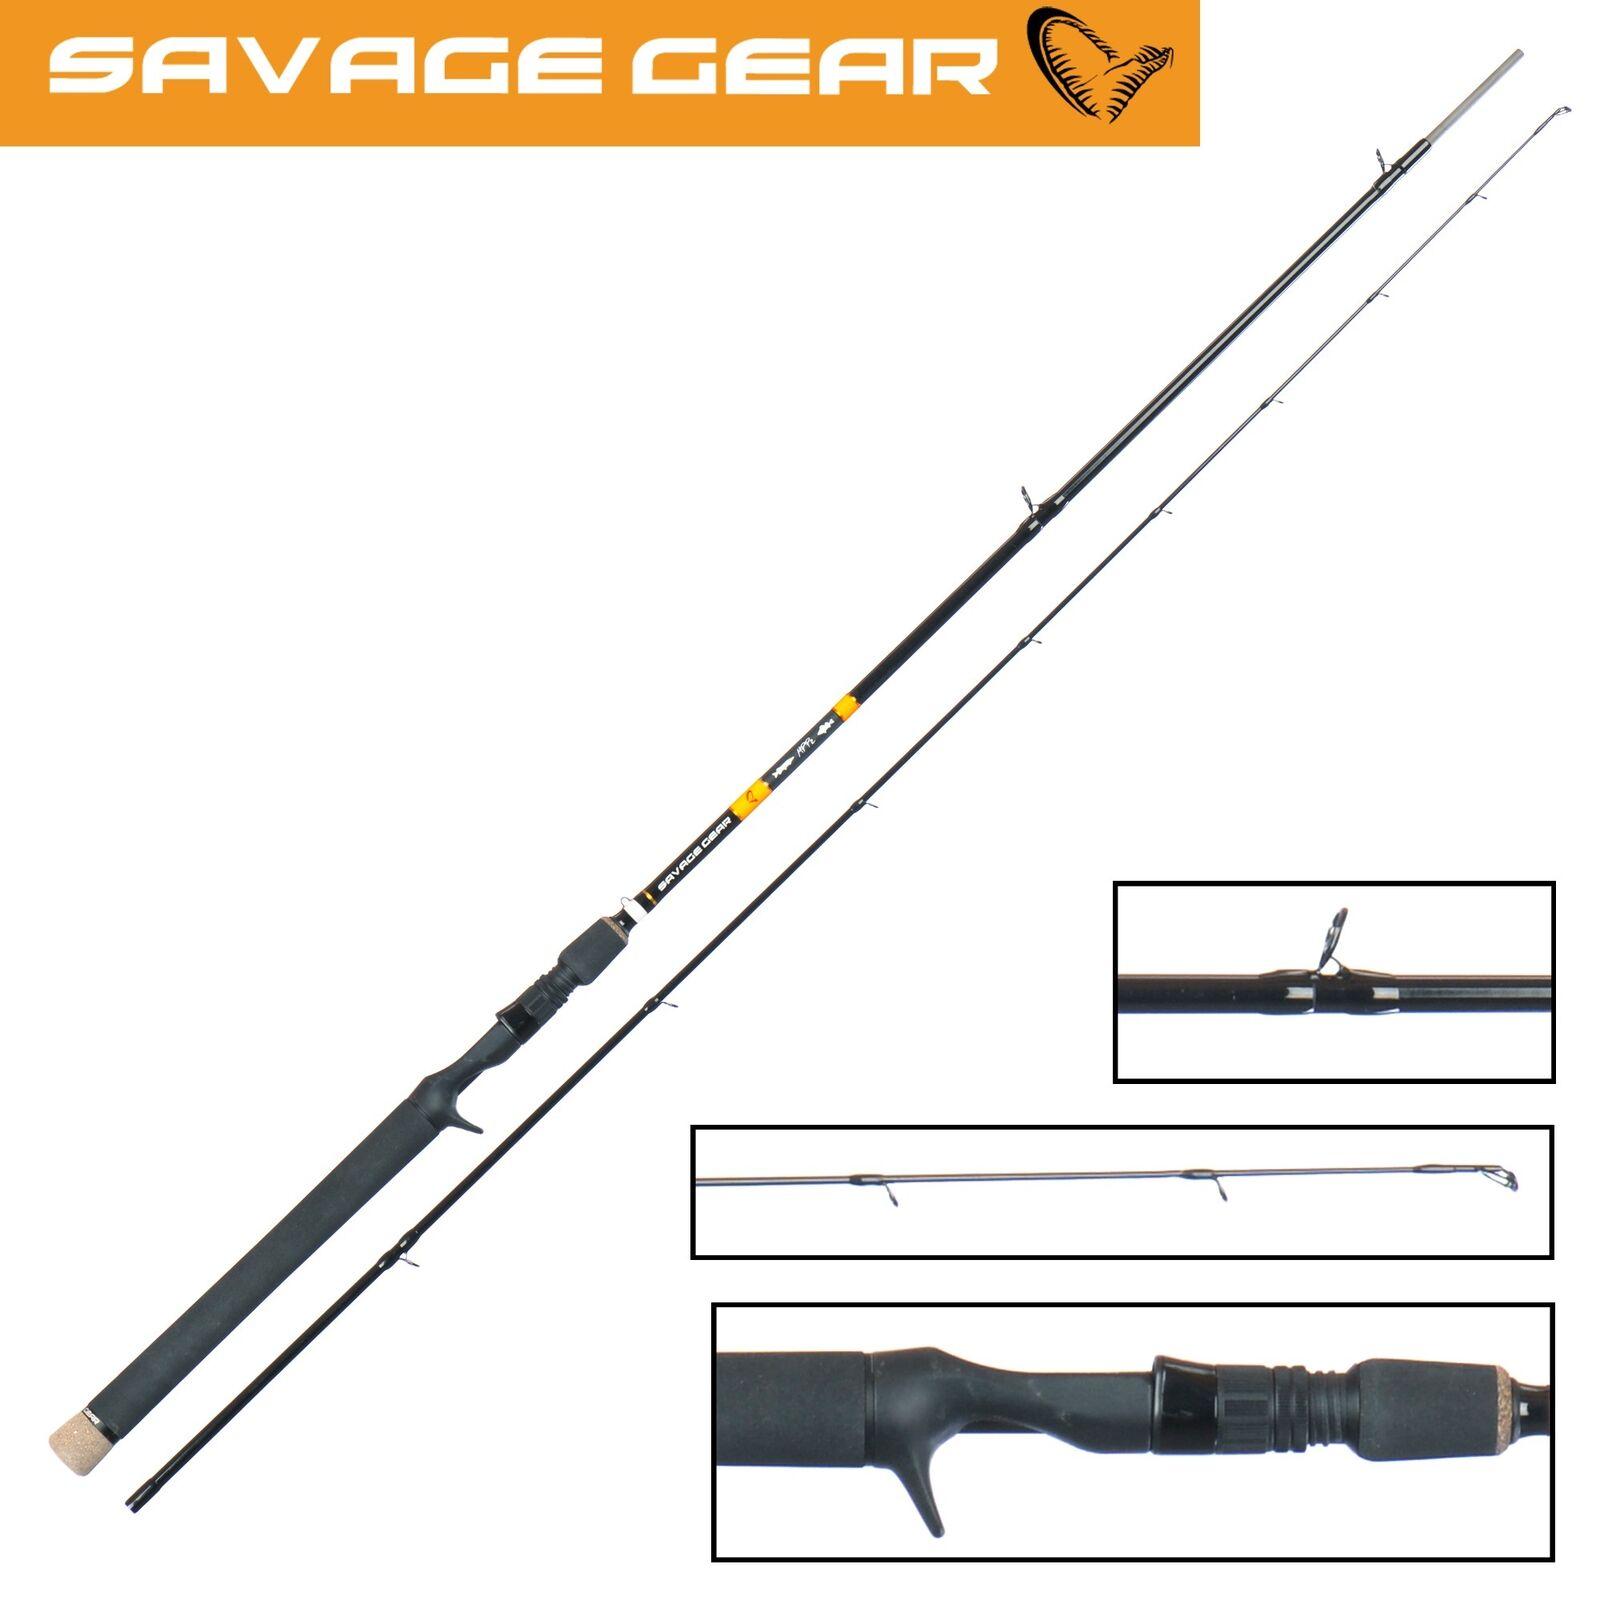 Savage Gear MPP2 Triggerrute 221cm 20-60g - Spinnrute, Hechtrute, Spinnangelrute